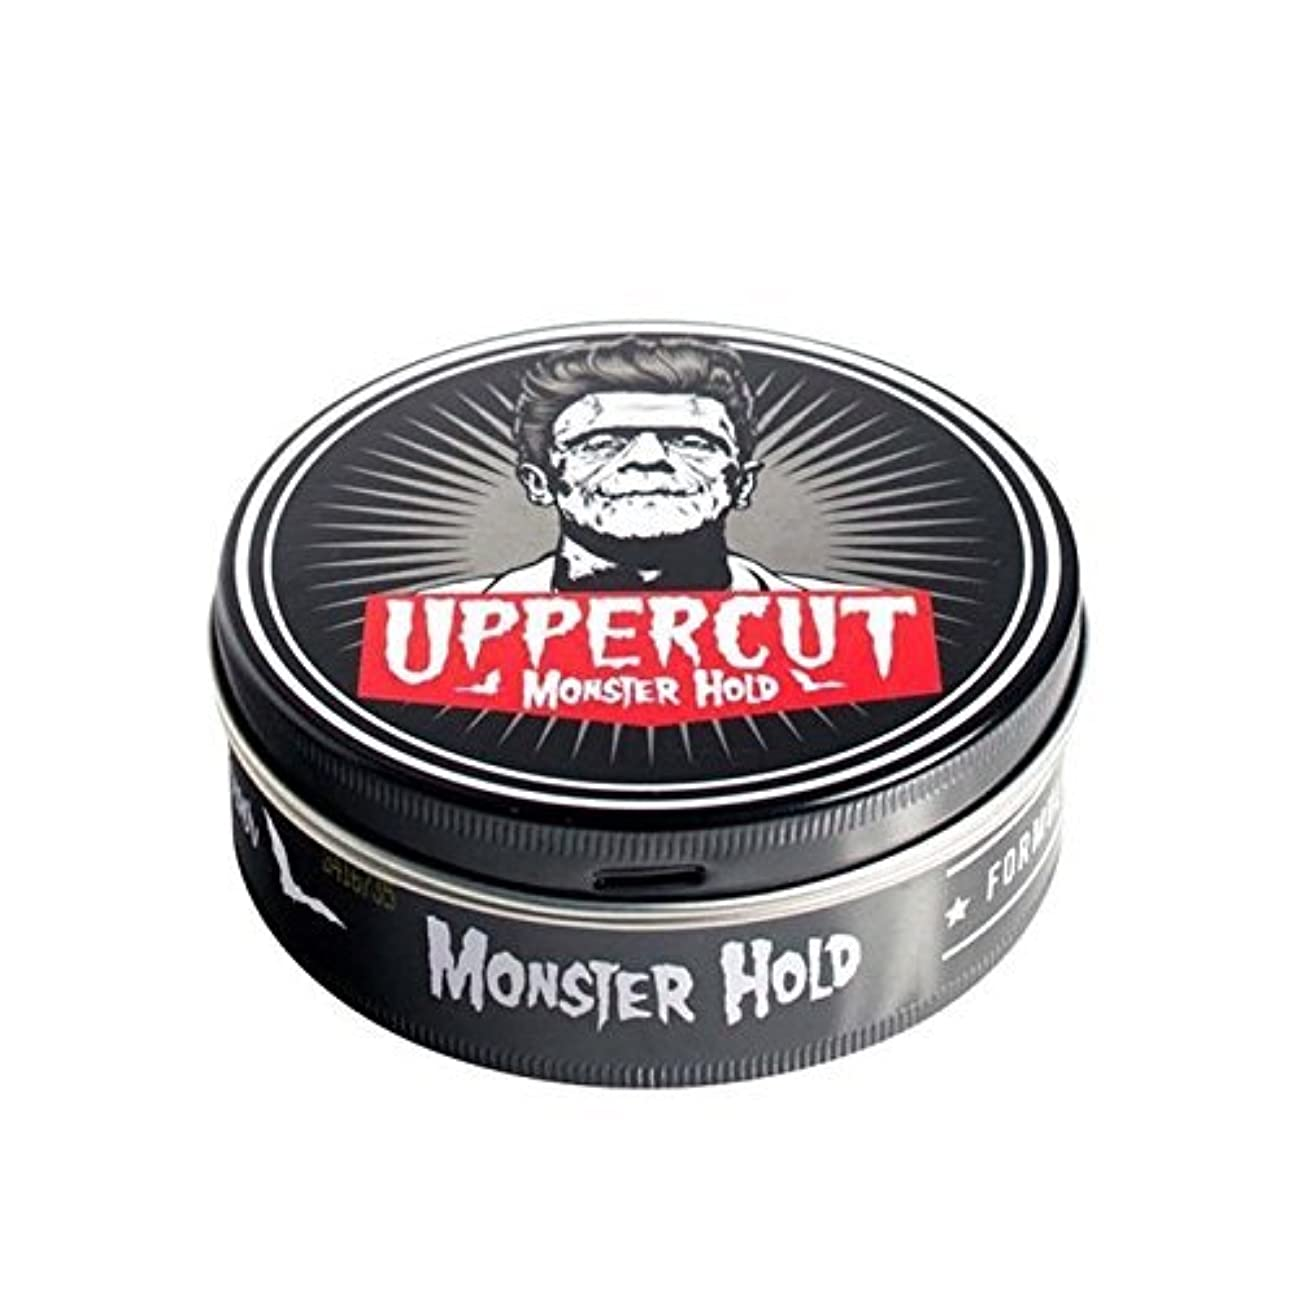 UPPERCUT DELUXE MONSTER HOLD アッパーカット デラックス モンスターホールド 70g